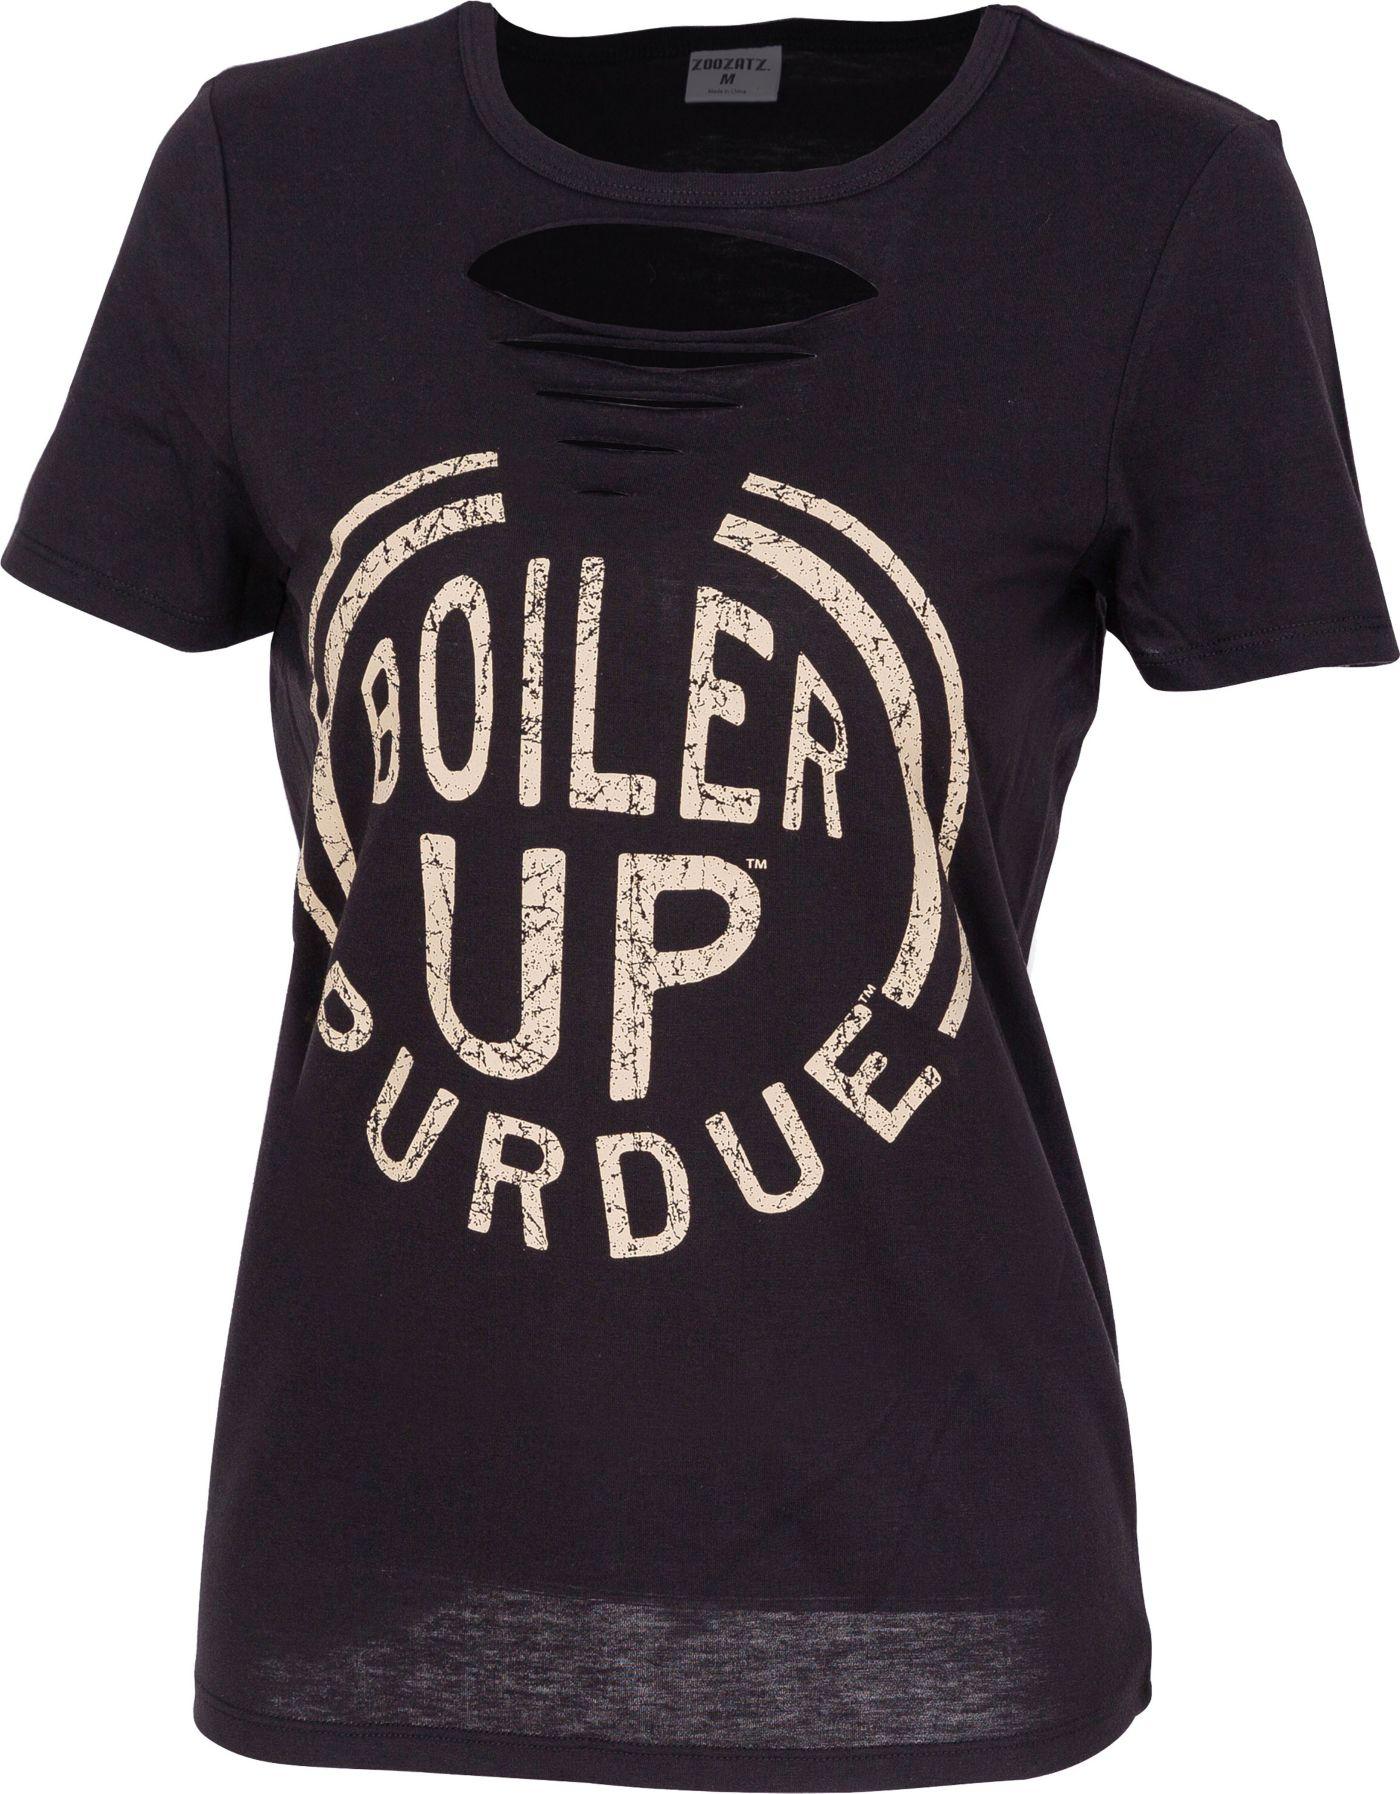 ZooZatz Women's Purdue Boilermakers Revival Ripped Black T-Shirt